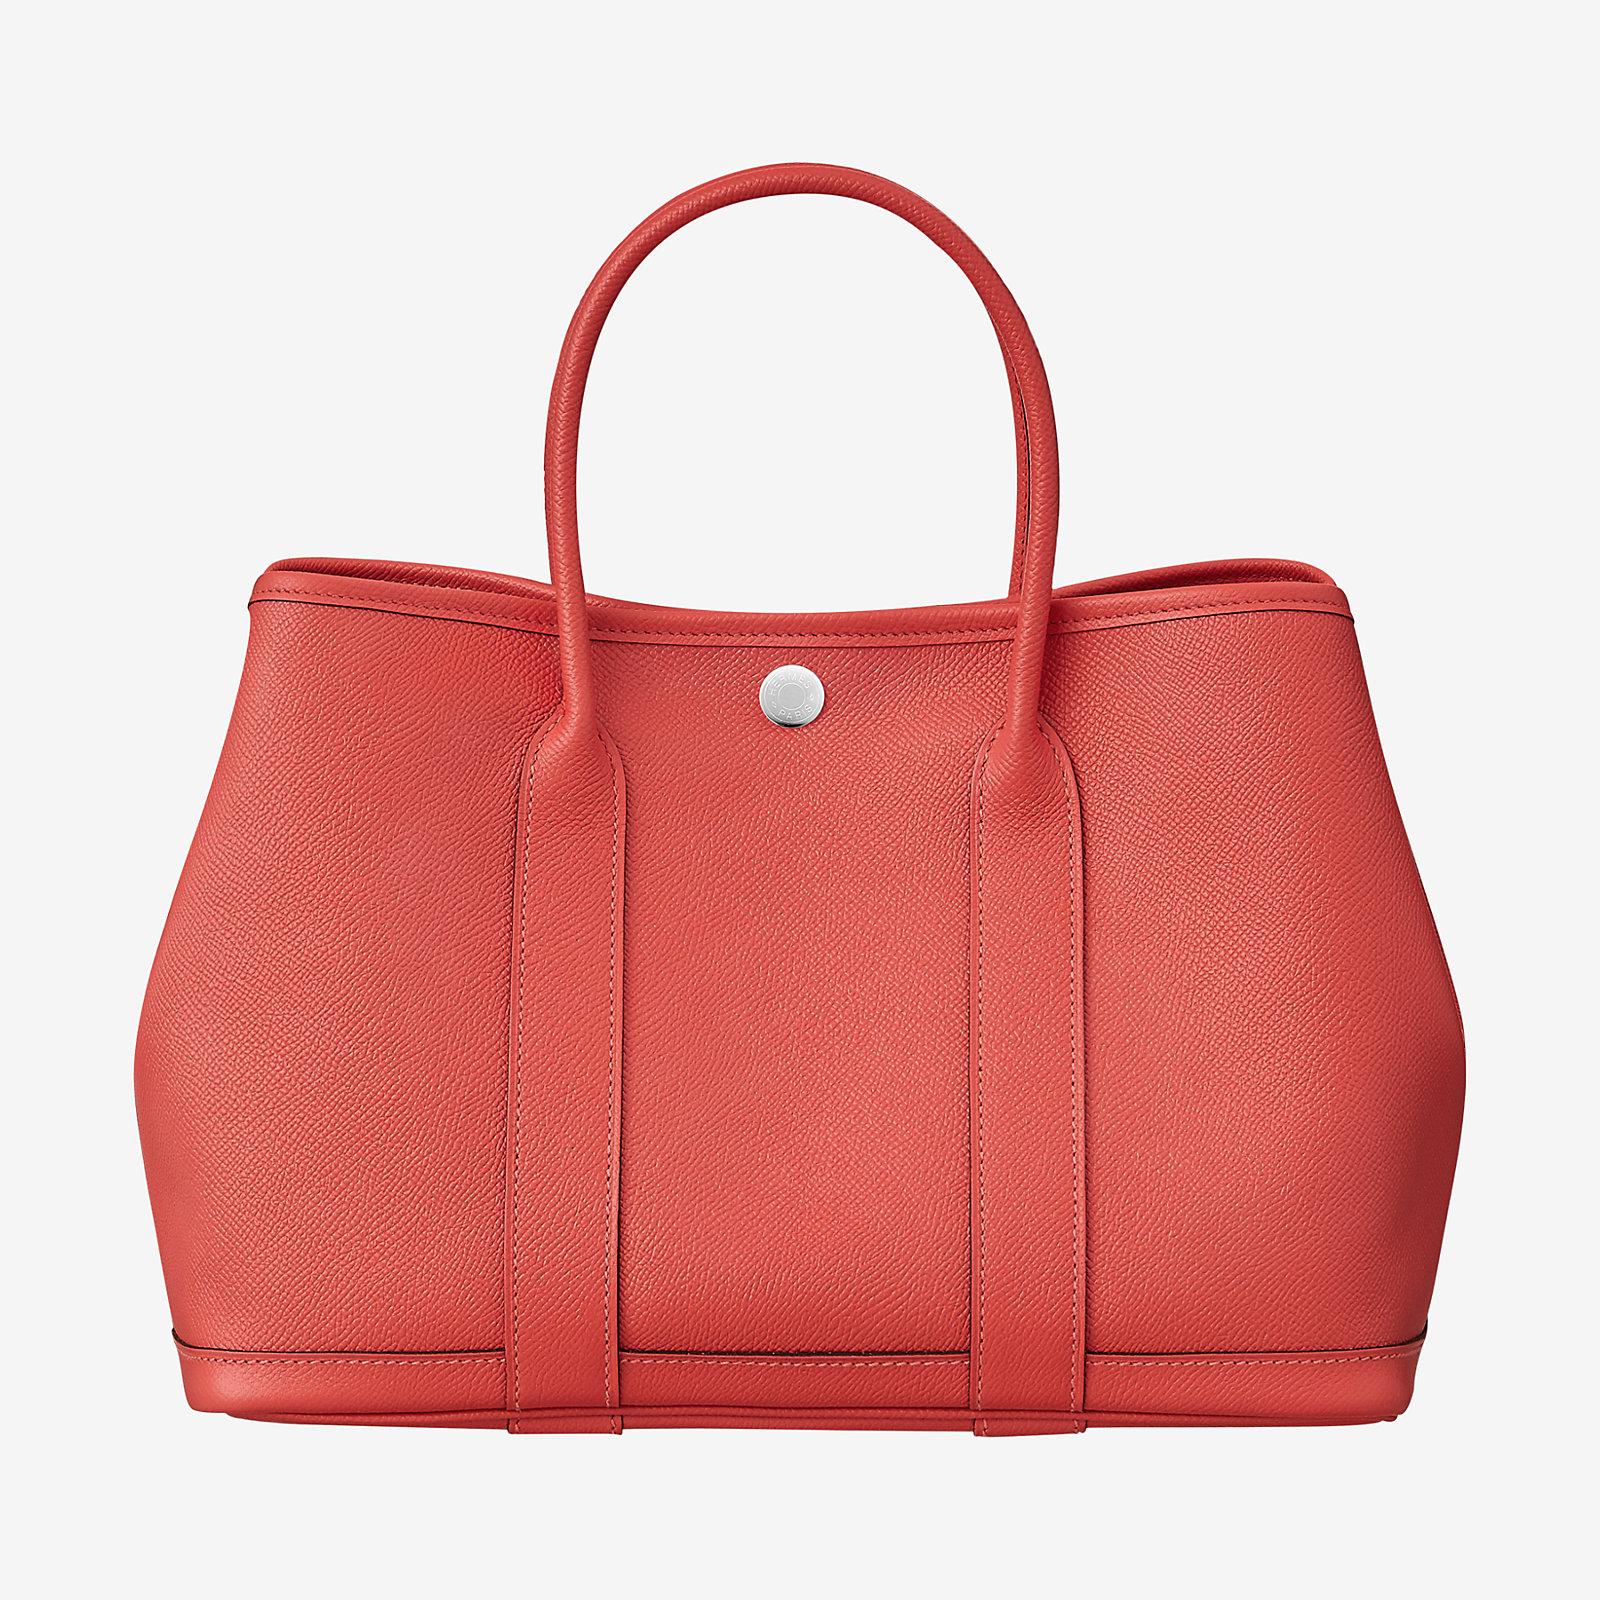 garden-party-30-bag--069574CKT5-front-1-300-0-1600-1600